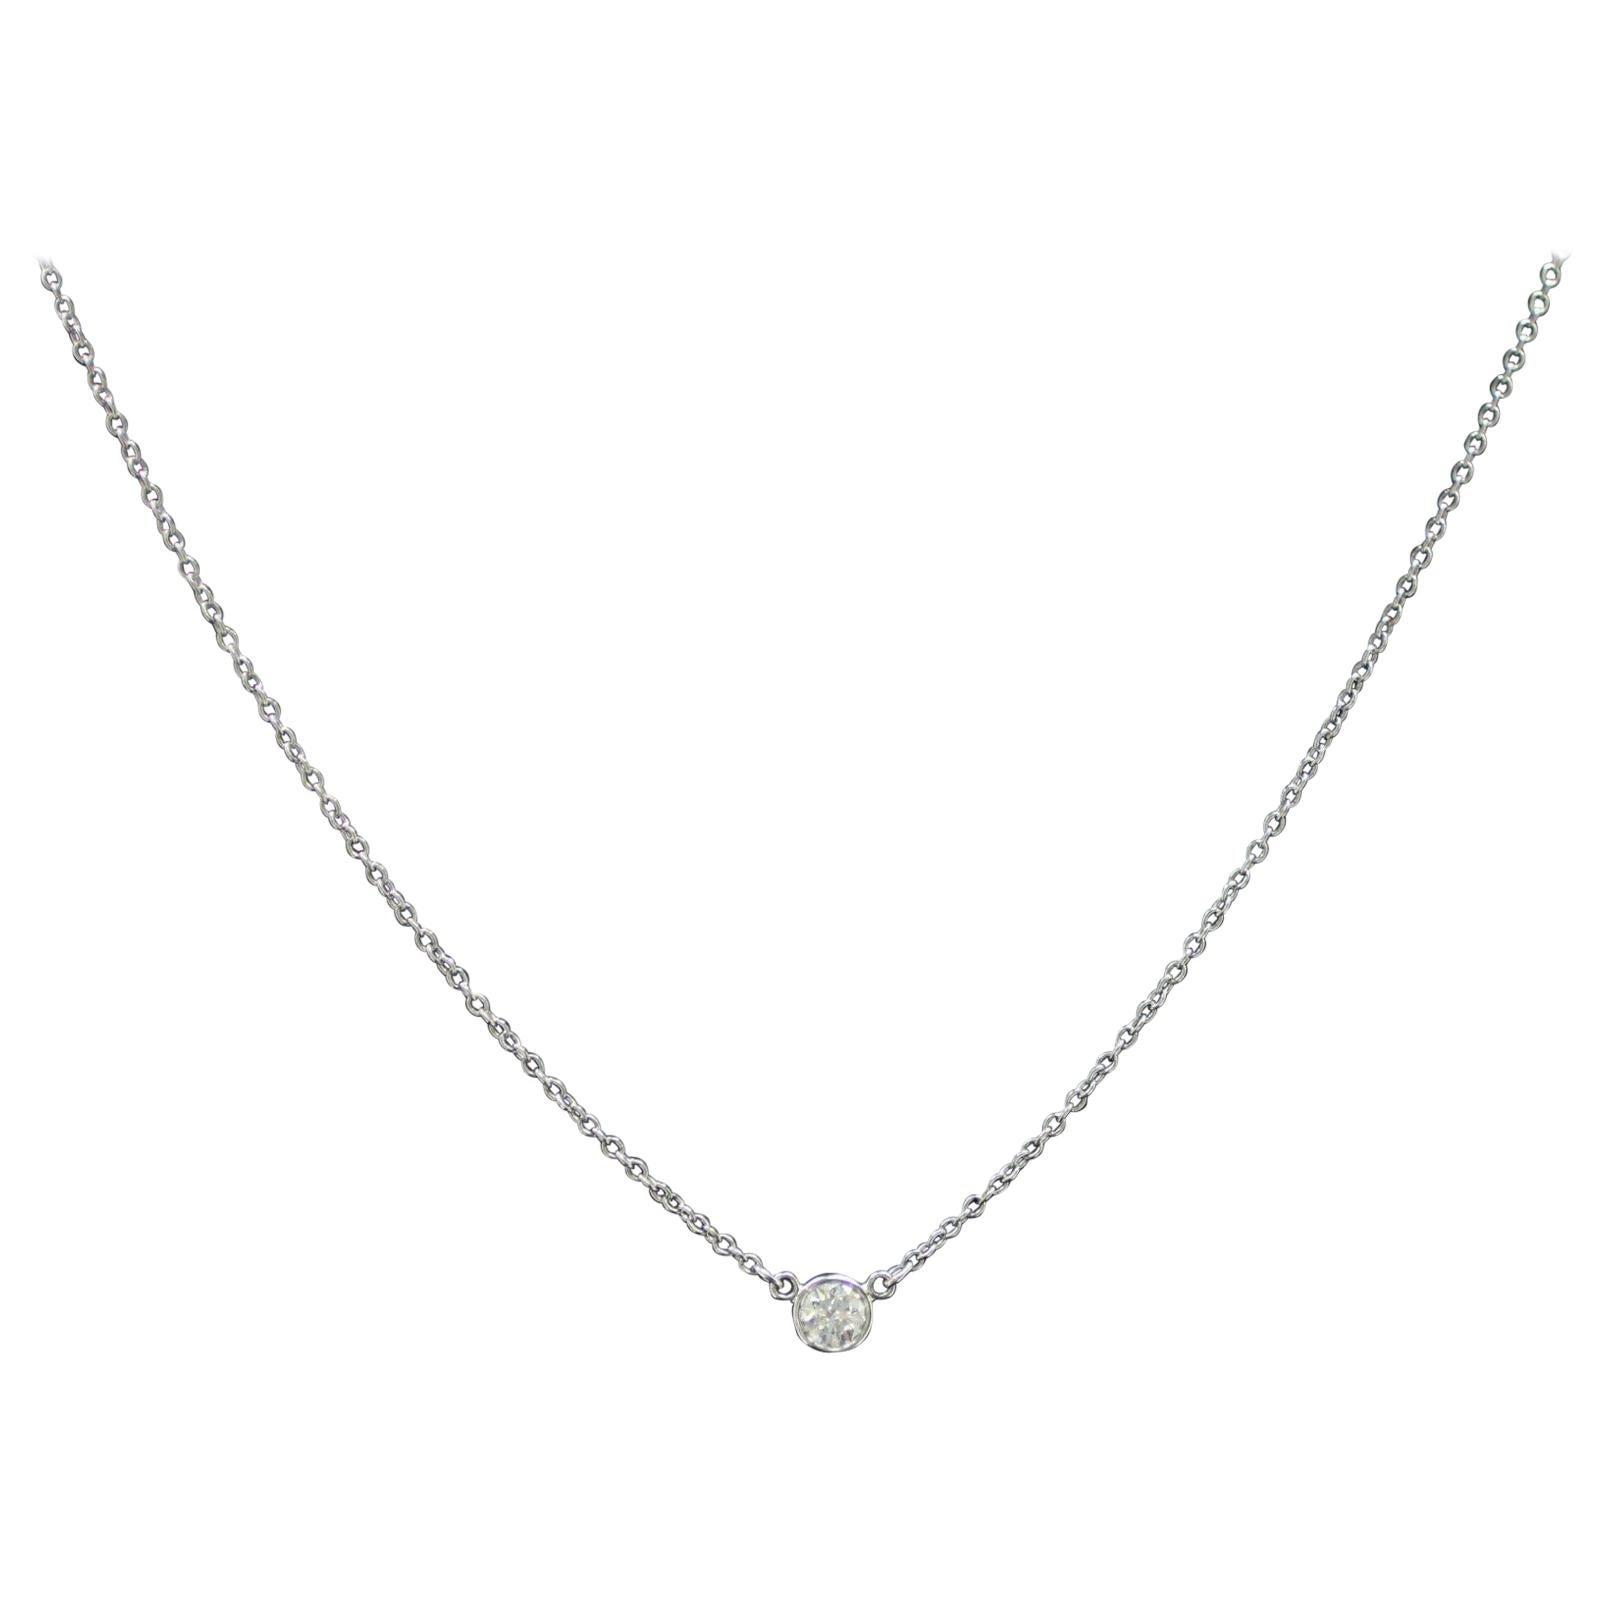 Authentic Tiffany & Co. Tiffany Round Diamond Pendant in Platinum